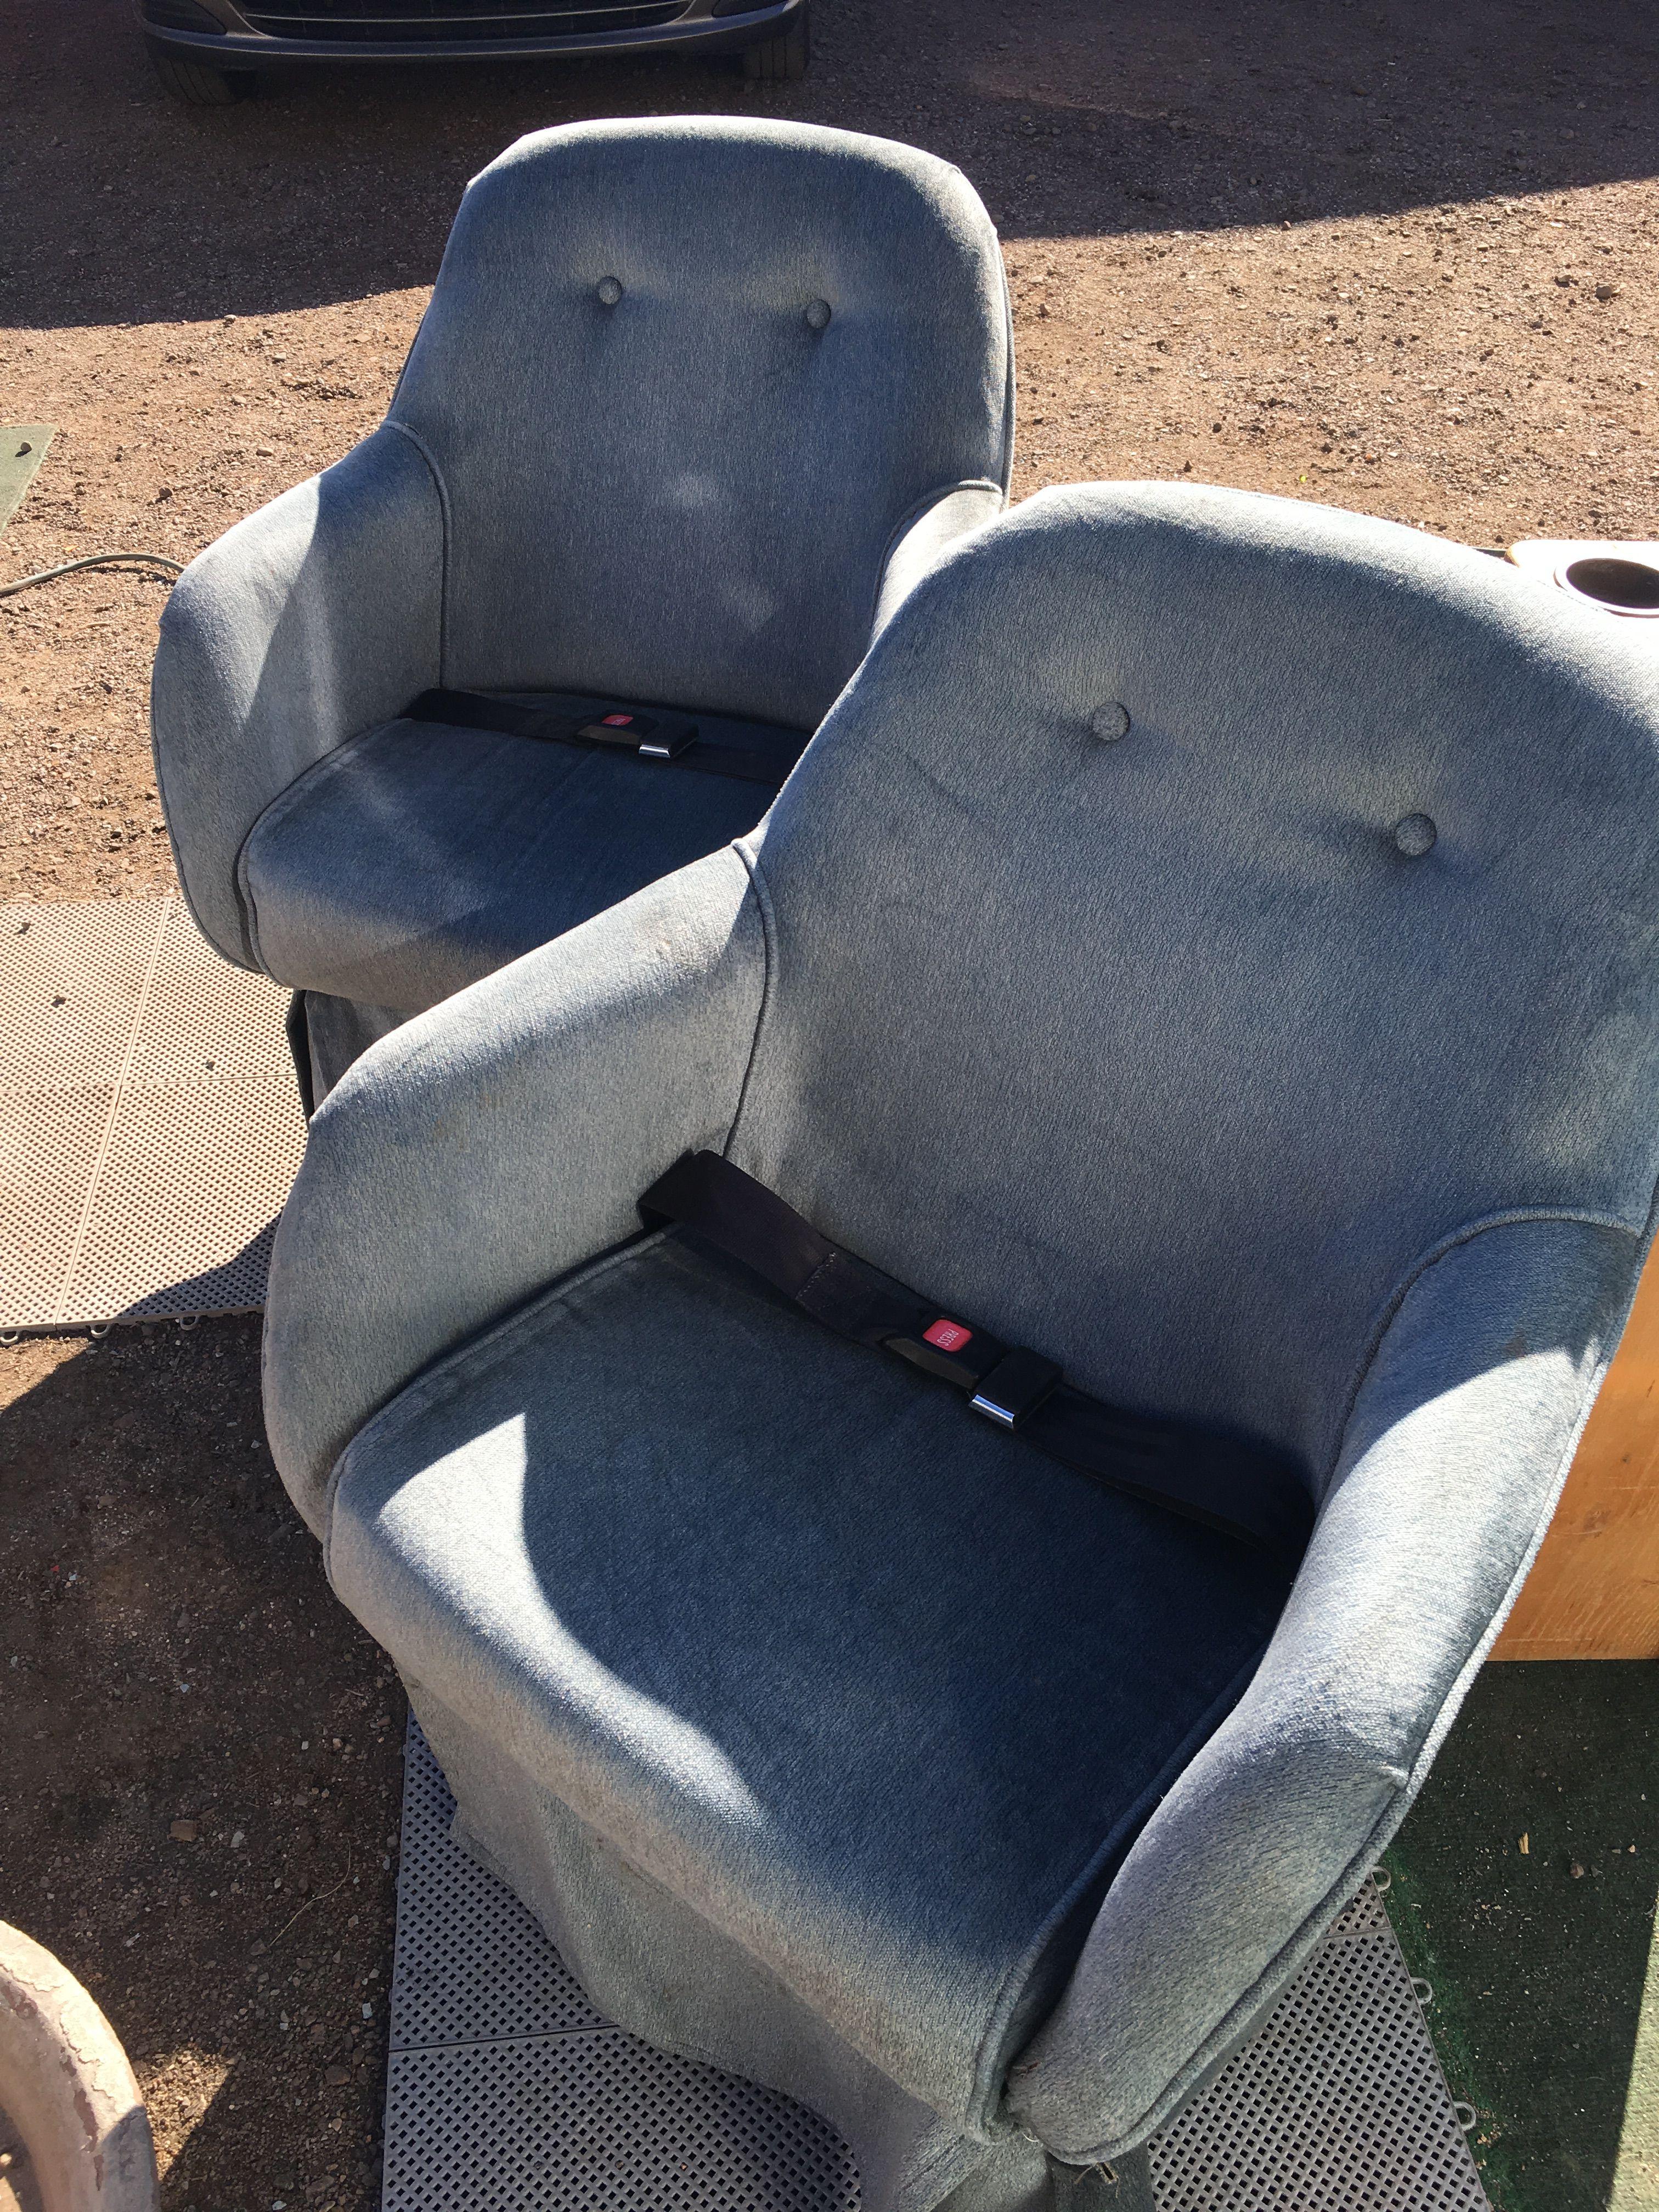 Class C RV Chairs at Arizona RV Salvage in Phoenix AZ